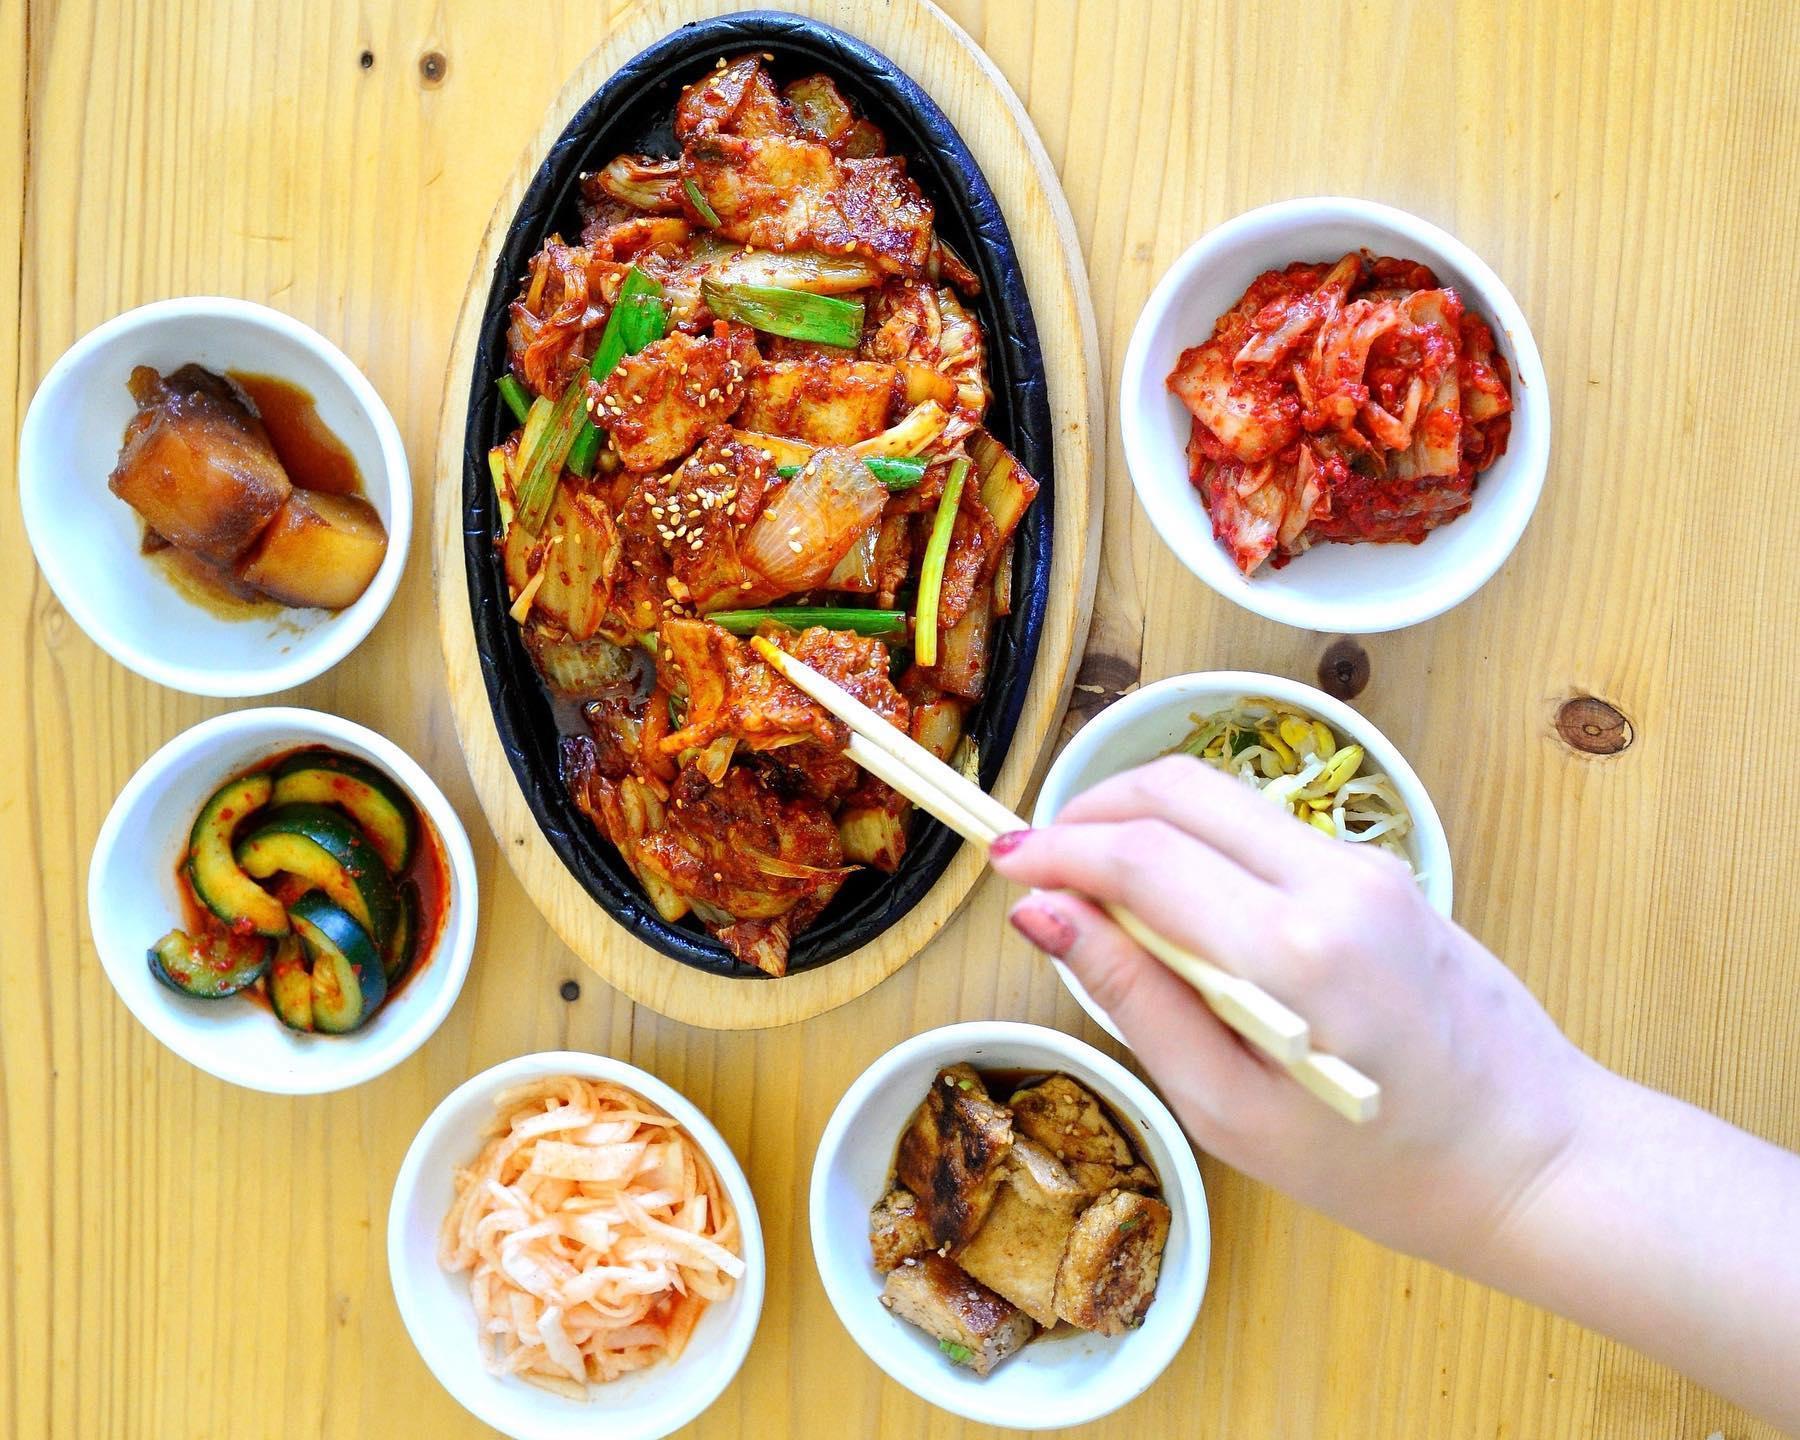 A Korean dish and banchan from Korea House